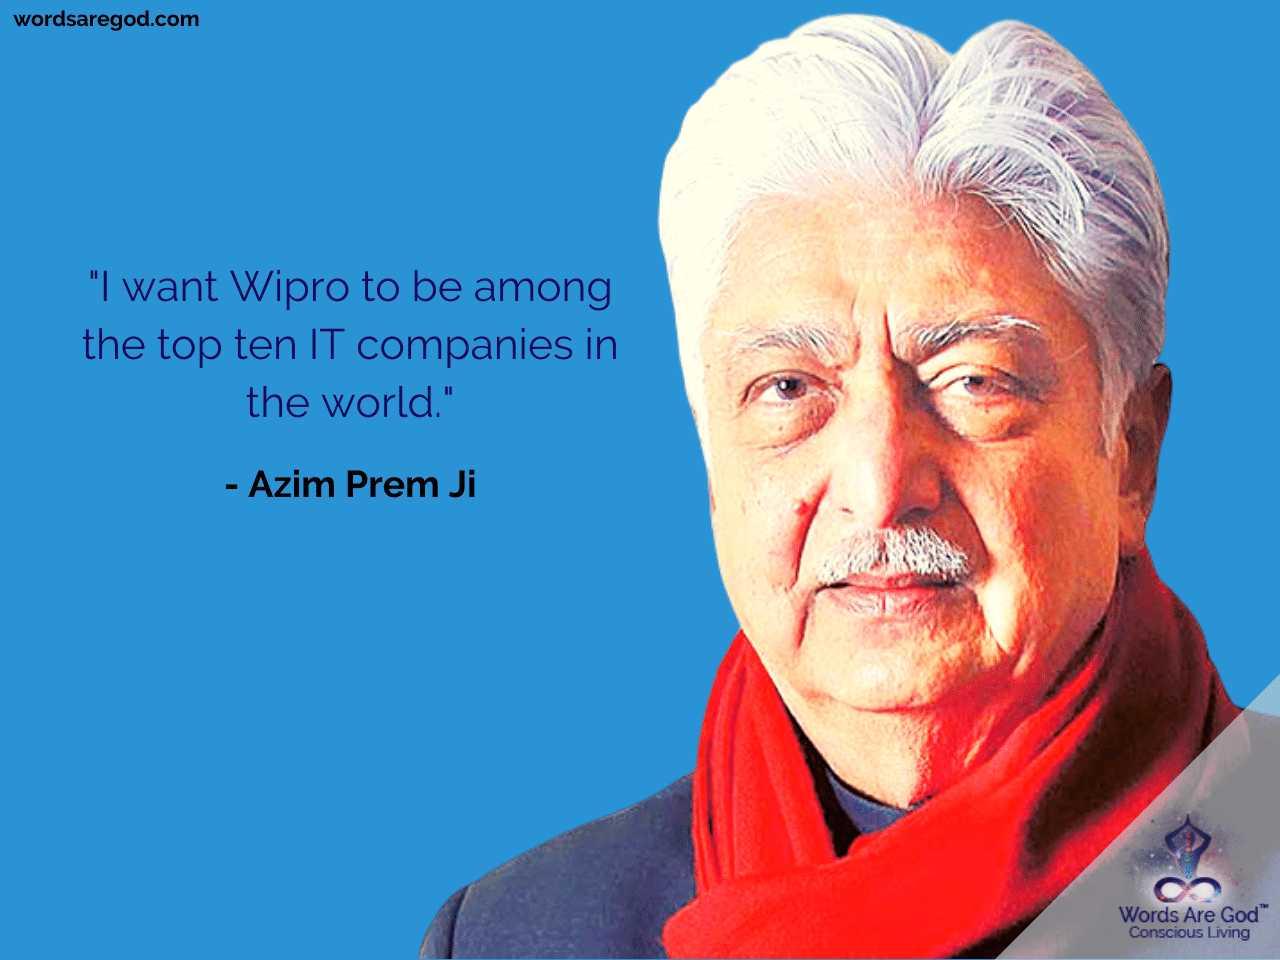 Azim Prem Ji Motivational Quote by Azim Prem Ji